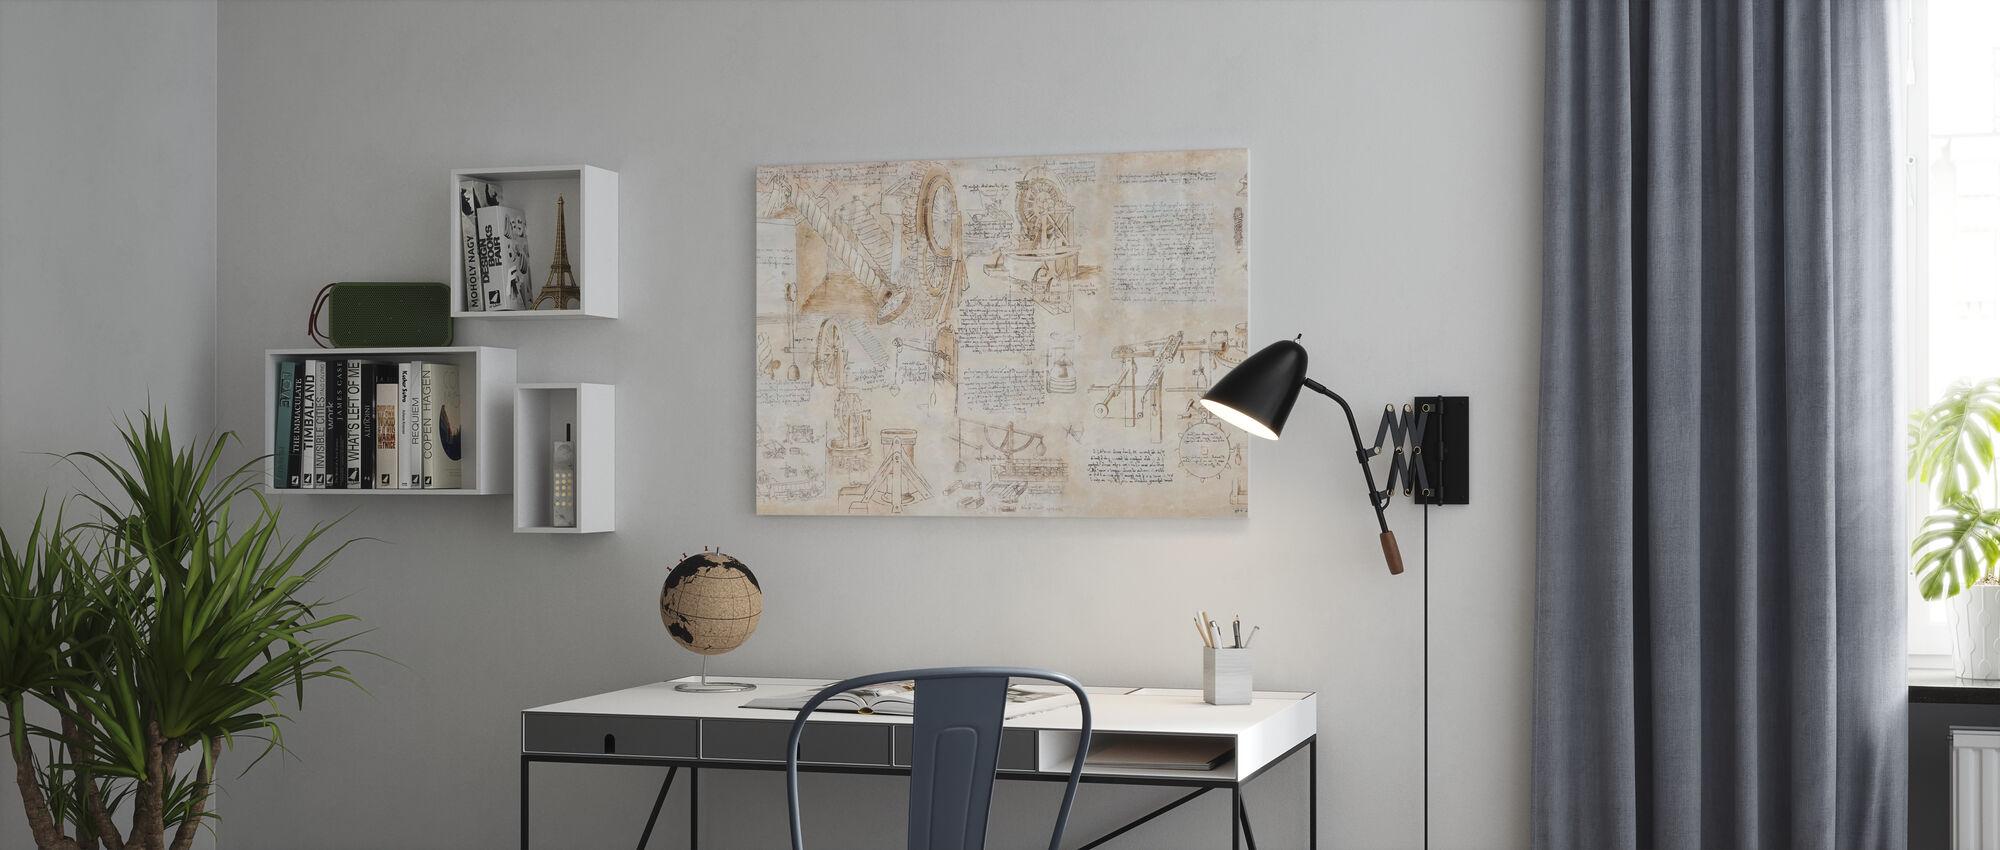 Da Vinci - Inventions - Canvas print - Office